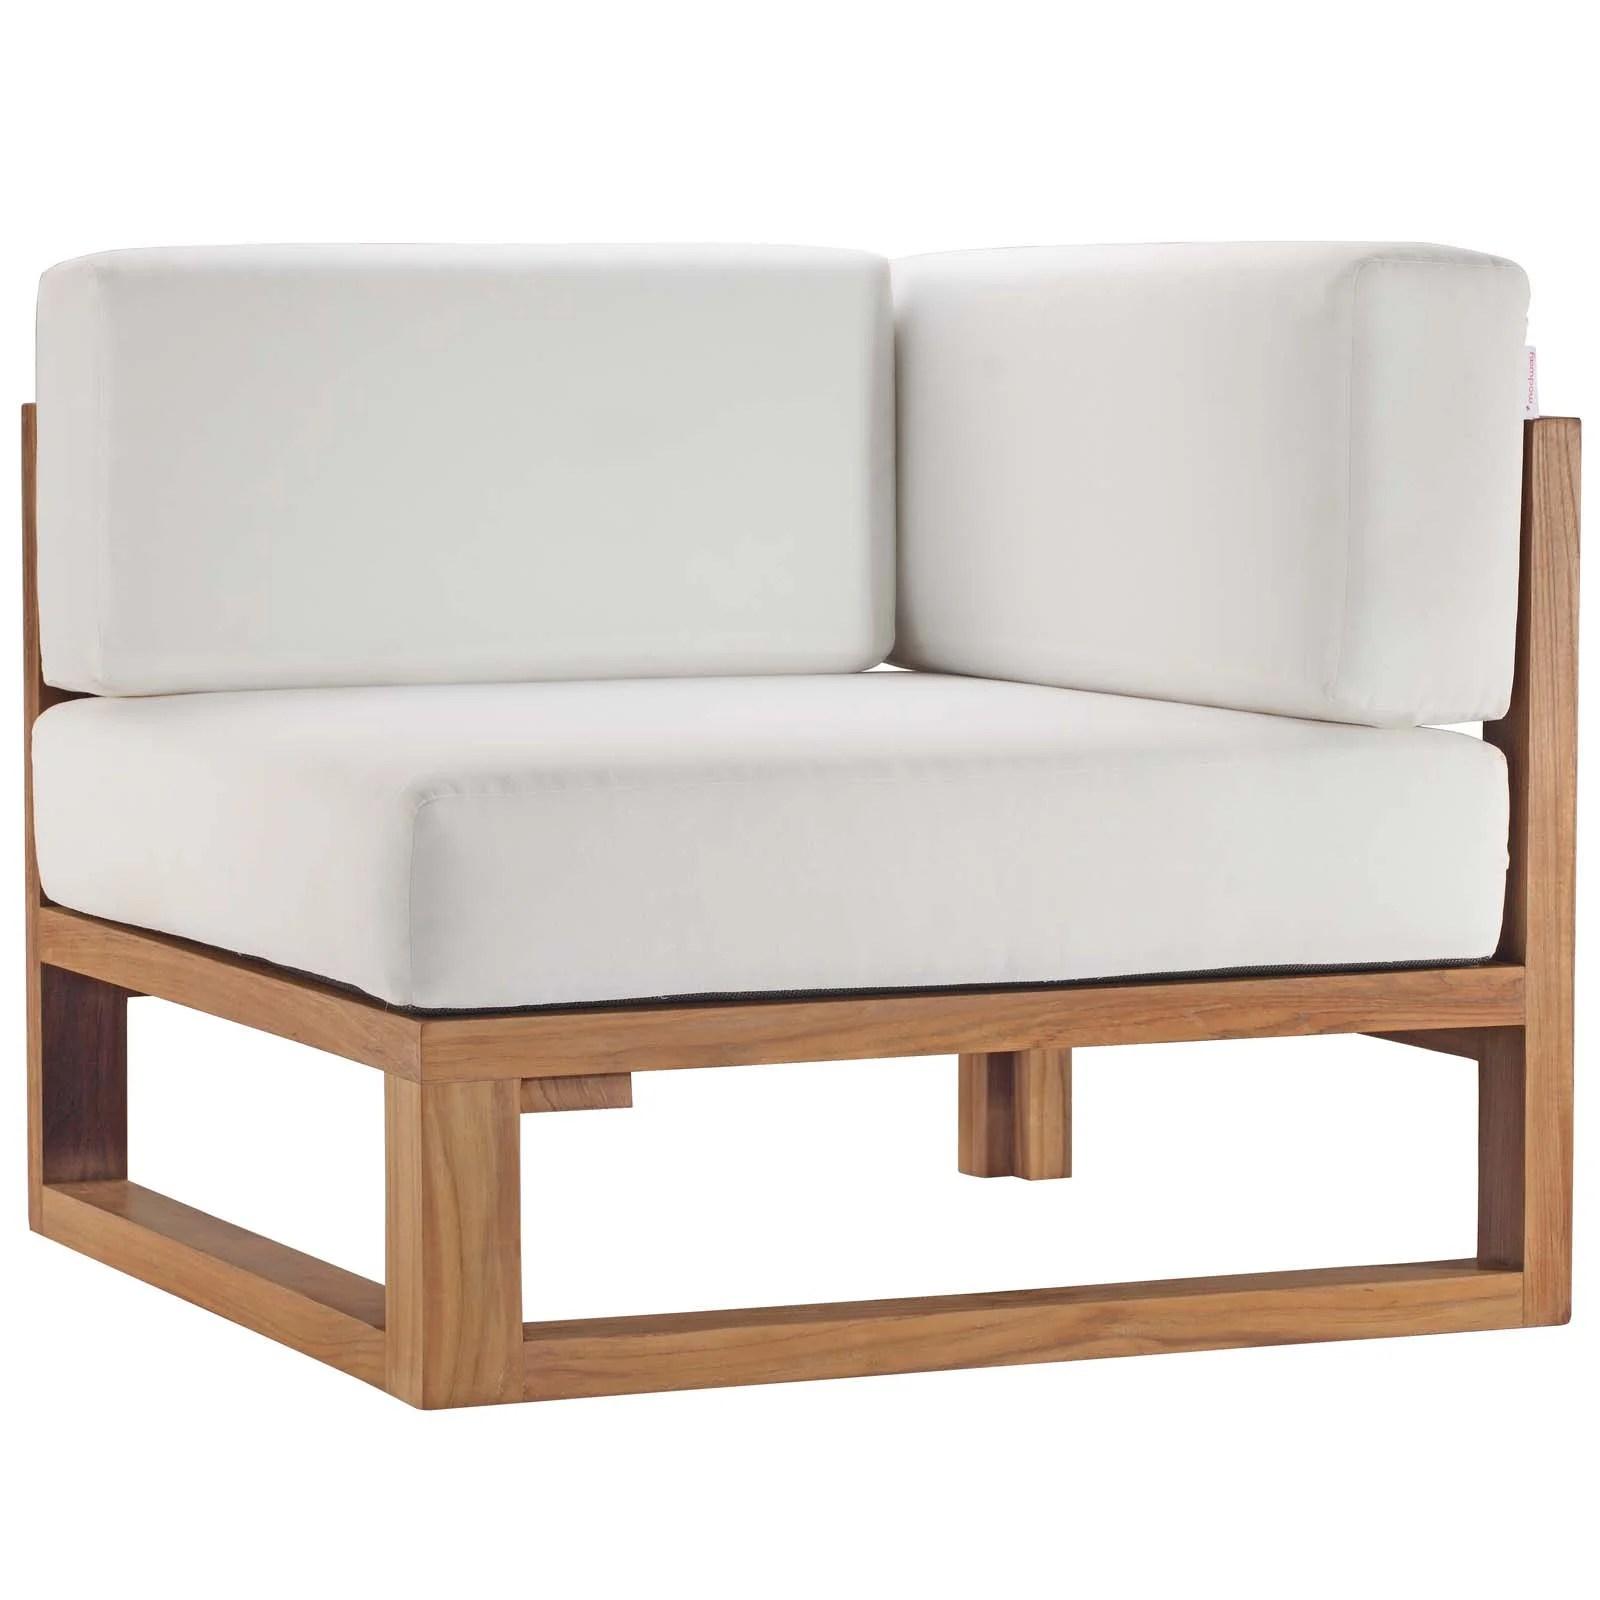 allmodern cambridge teak wood corner patio chair with cushions wayfair